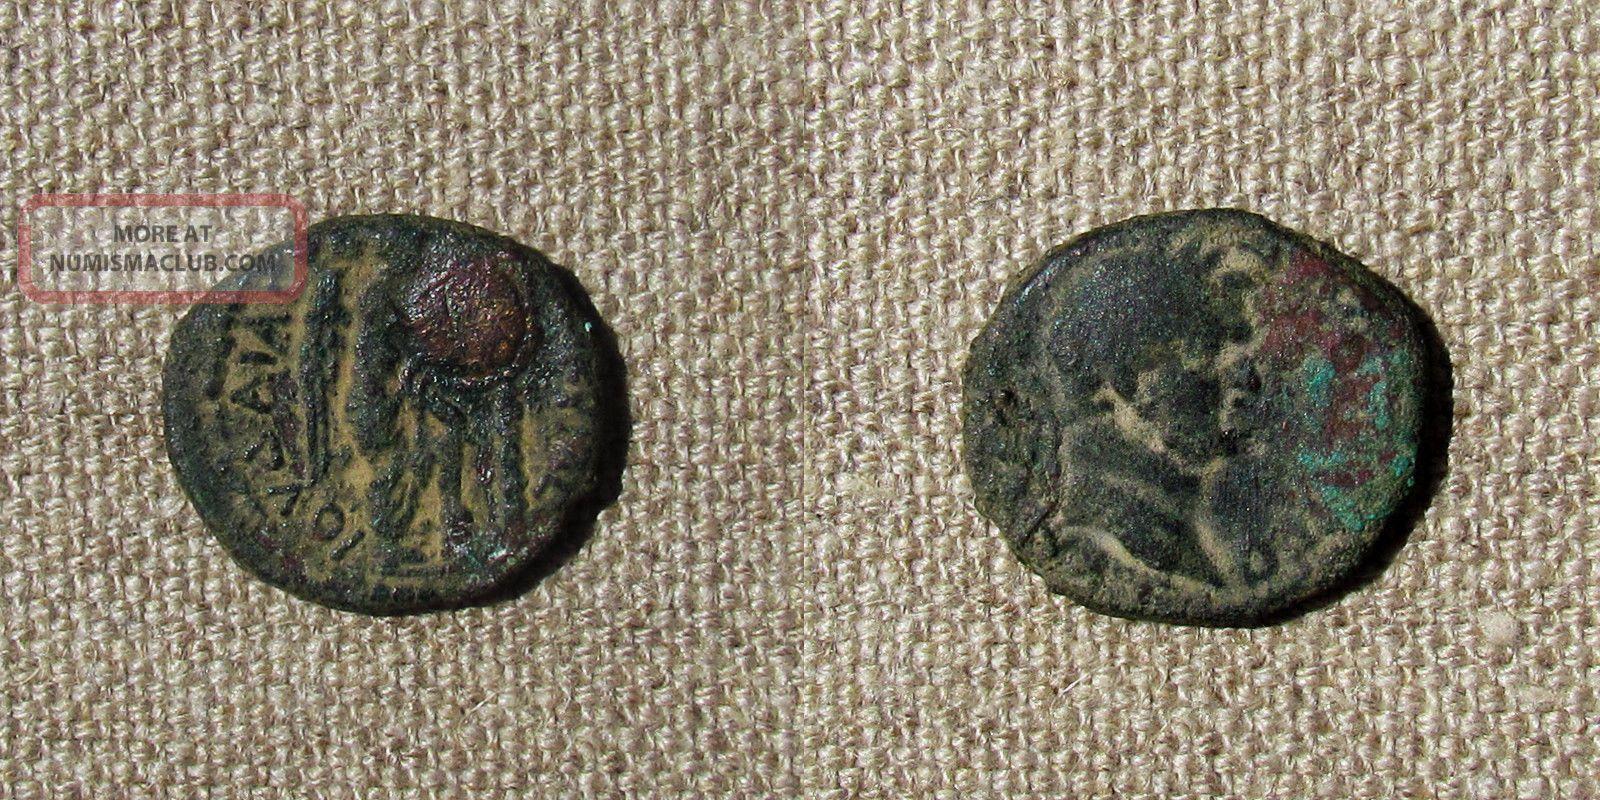 Judaea Capta,  Titus,  Ad 71 - 73,  19.  0 Mm,  7.  0 Gm. Coins: Ancient photo